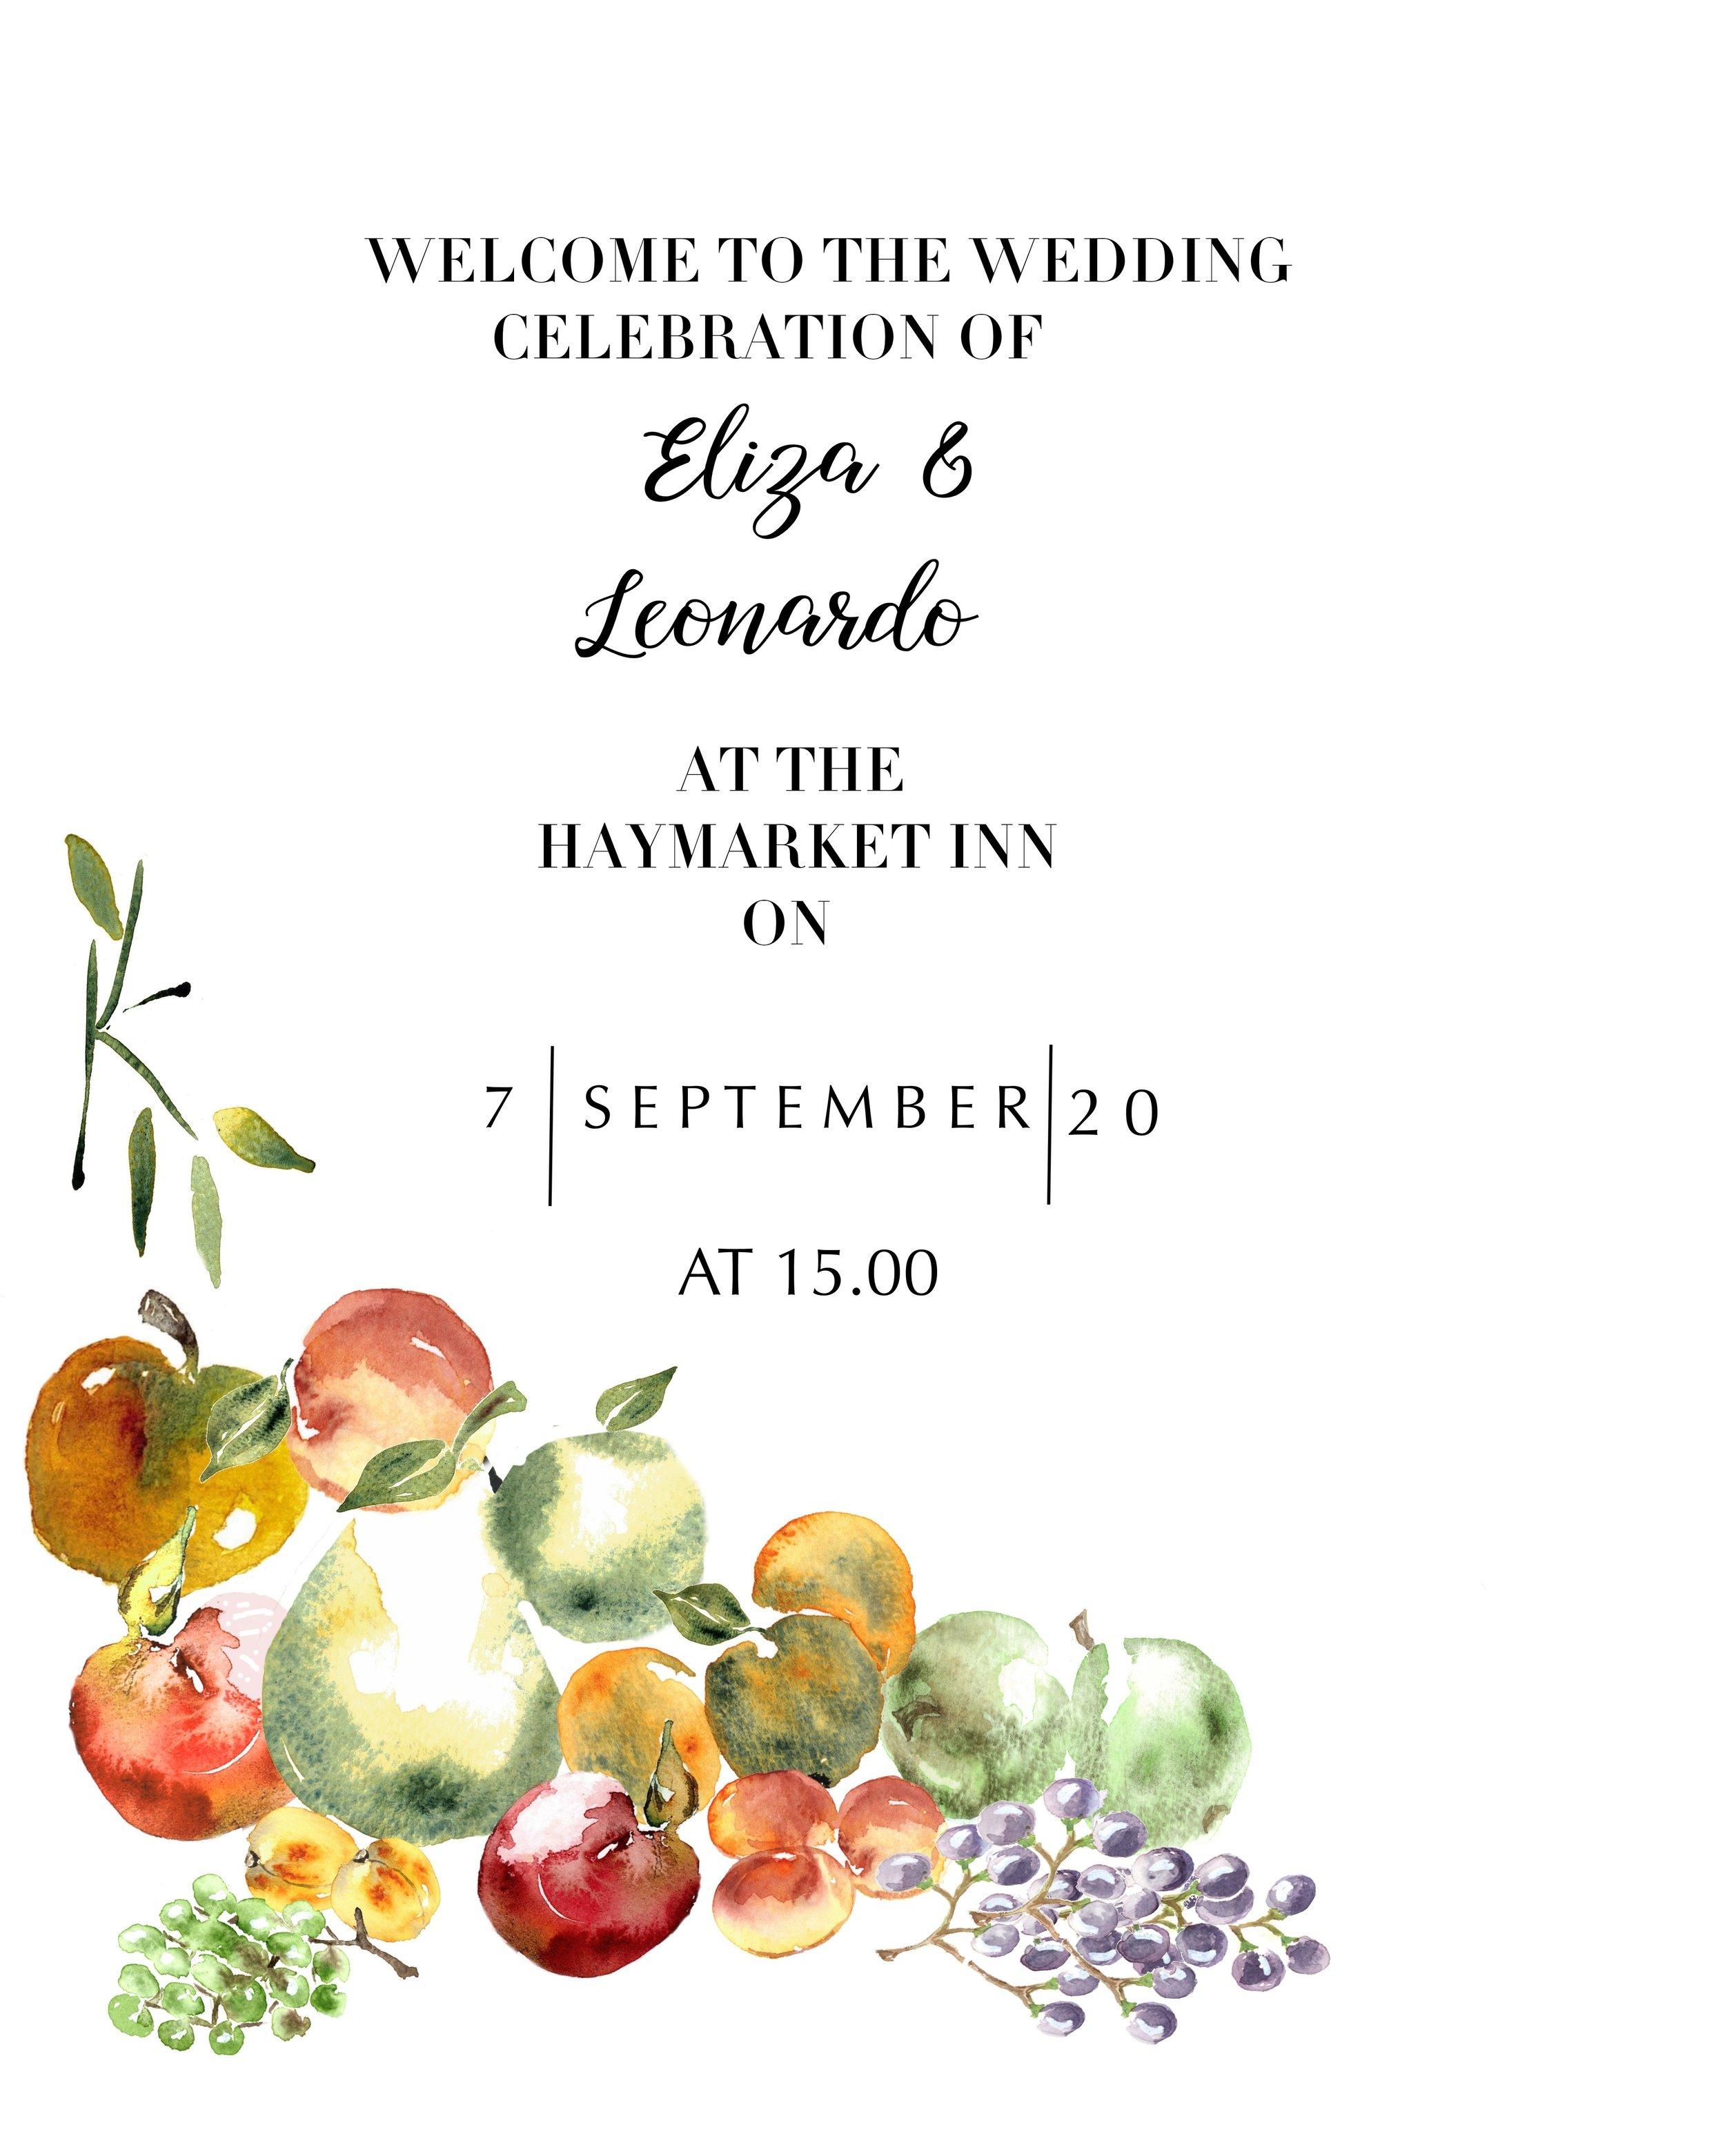 Watercolor Fruit Invitation Card Template Anna Hedeklint Design Illustration